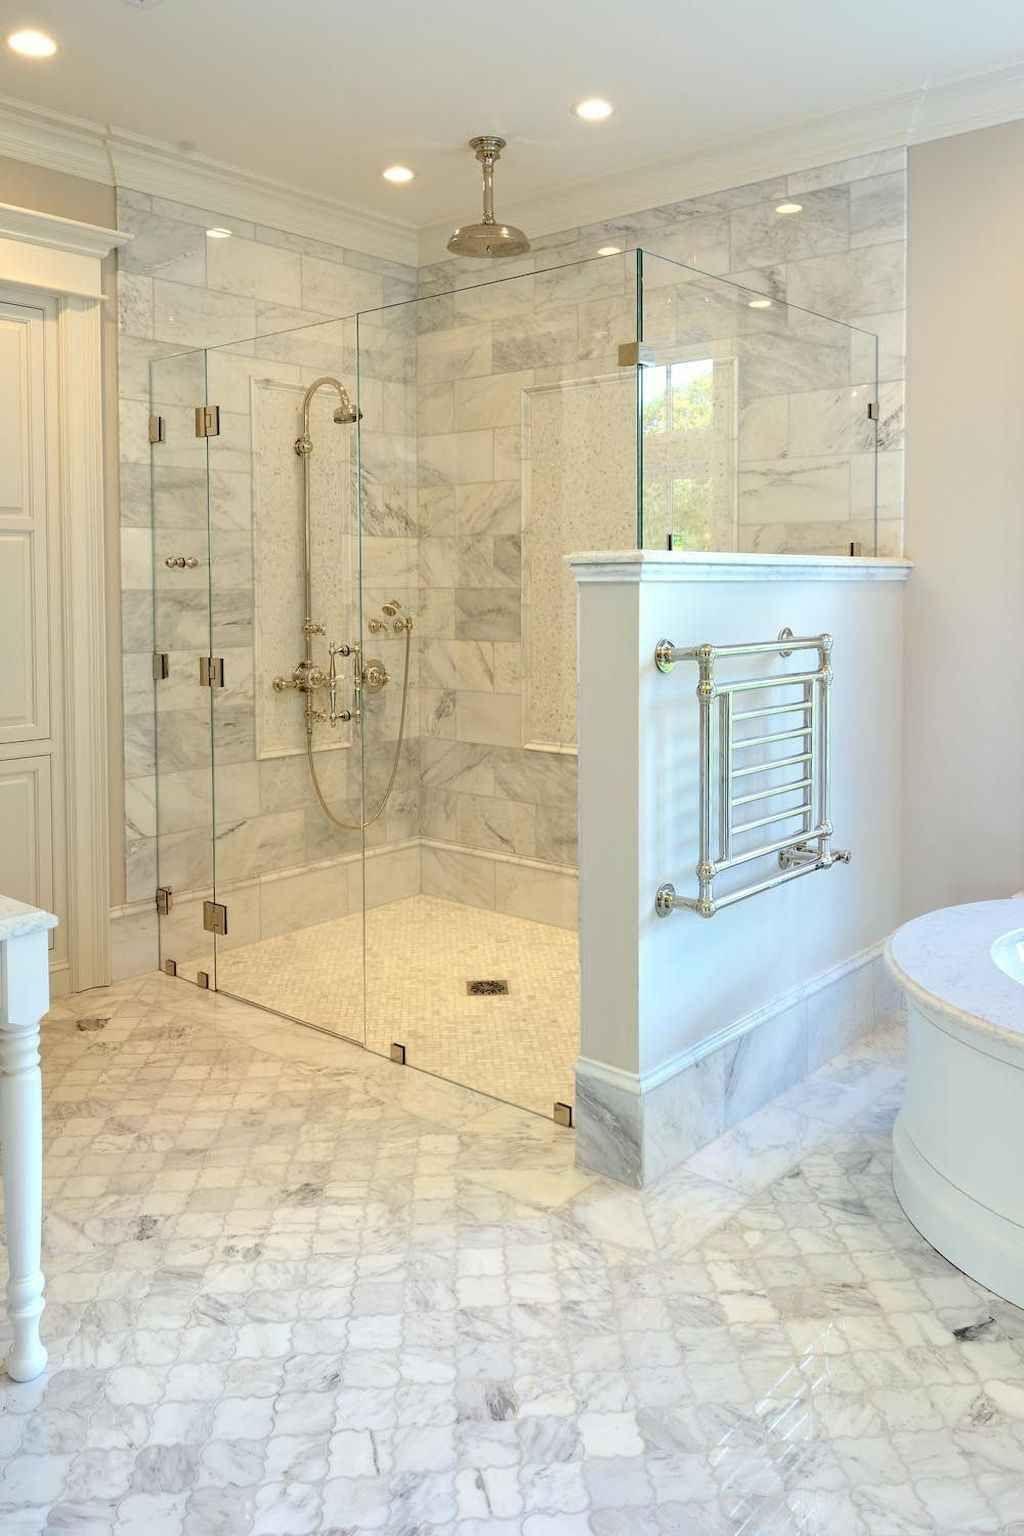 65 Beautiful Bathroom Shower Remodel Ideas – Gladecor.com